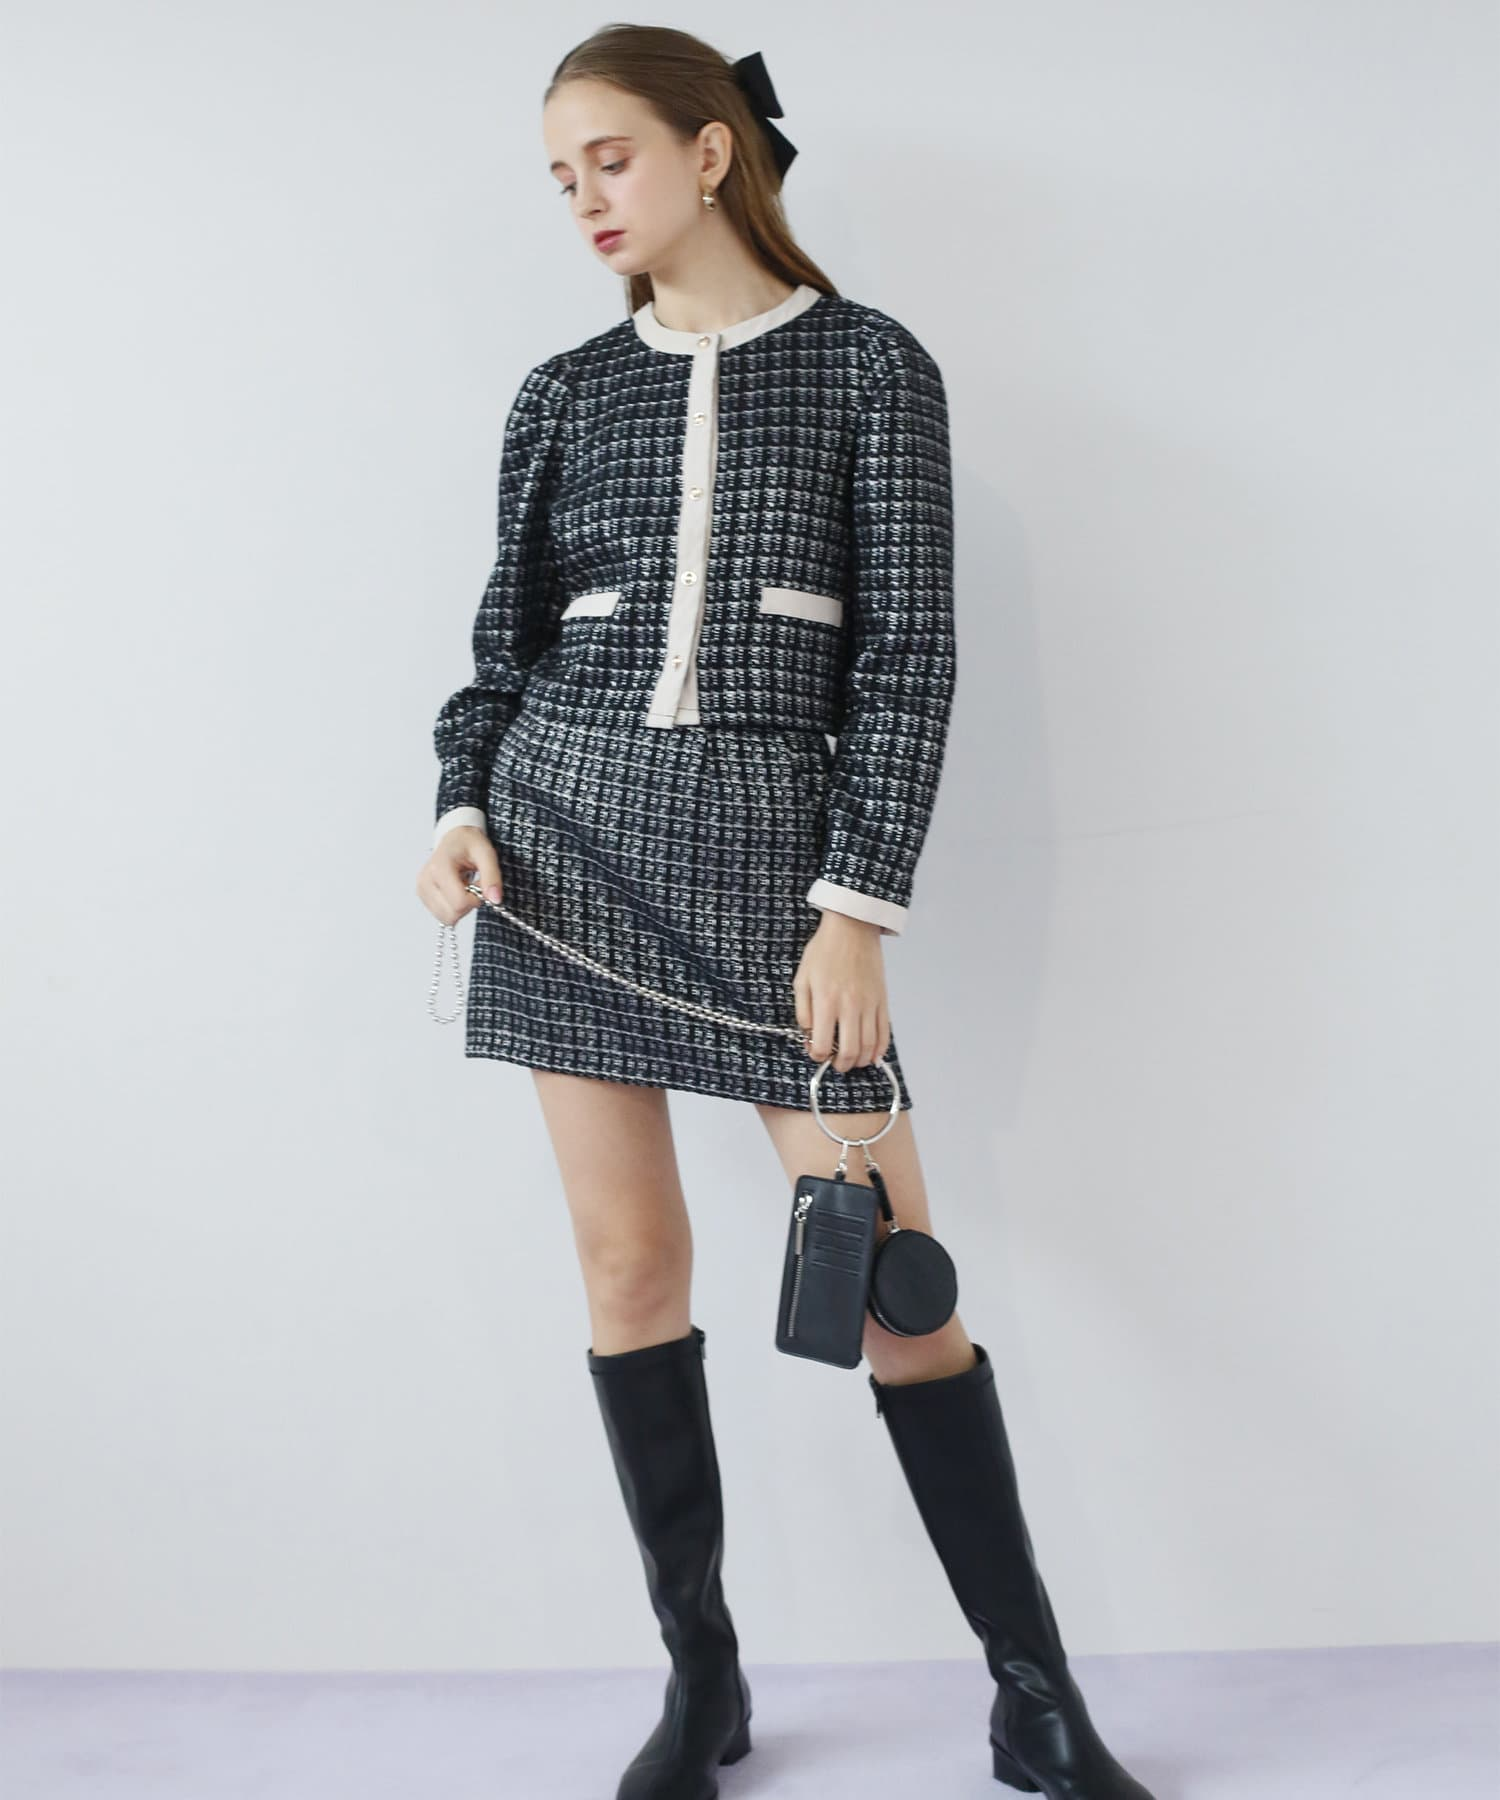 Seemi.by NICE CLAUP(シーミーバイナイスクラップ) パイピングスカート